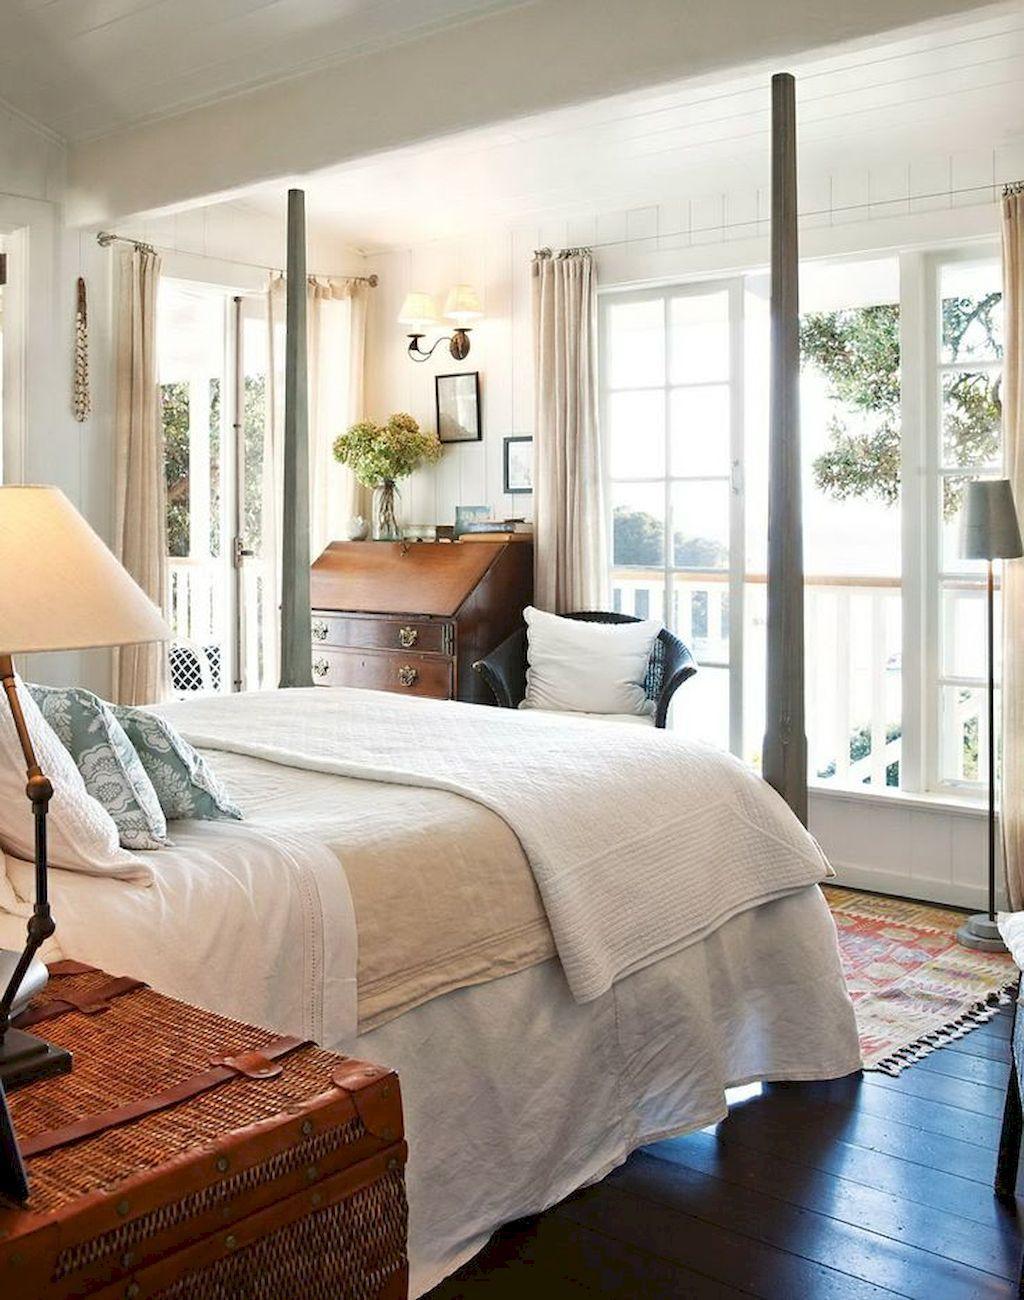 Master bedroom images  Romantic mediterranean master bedroom ideas   Master bedroom and